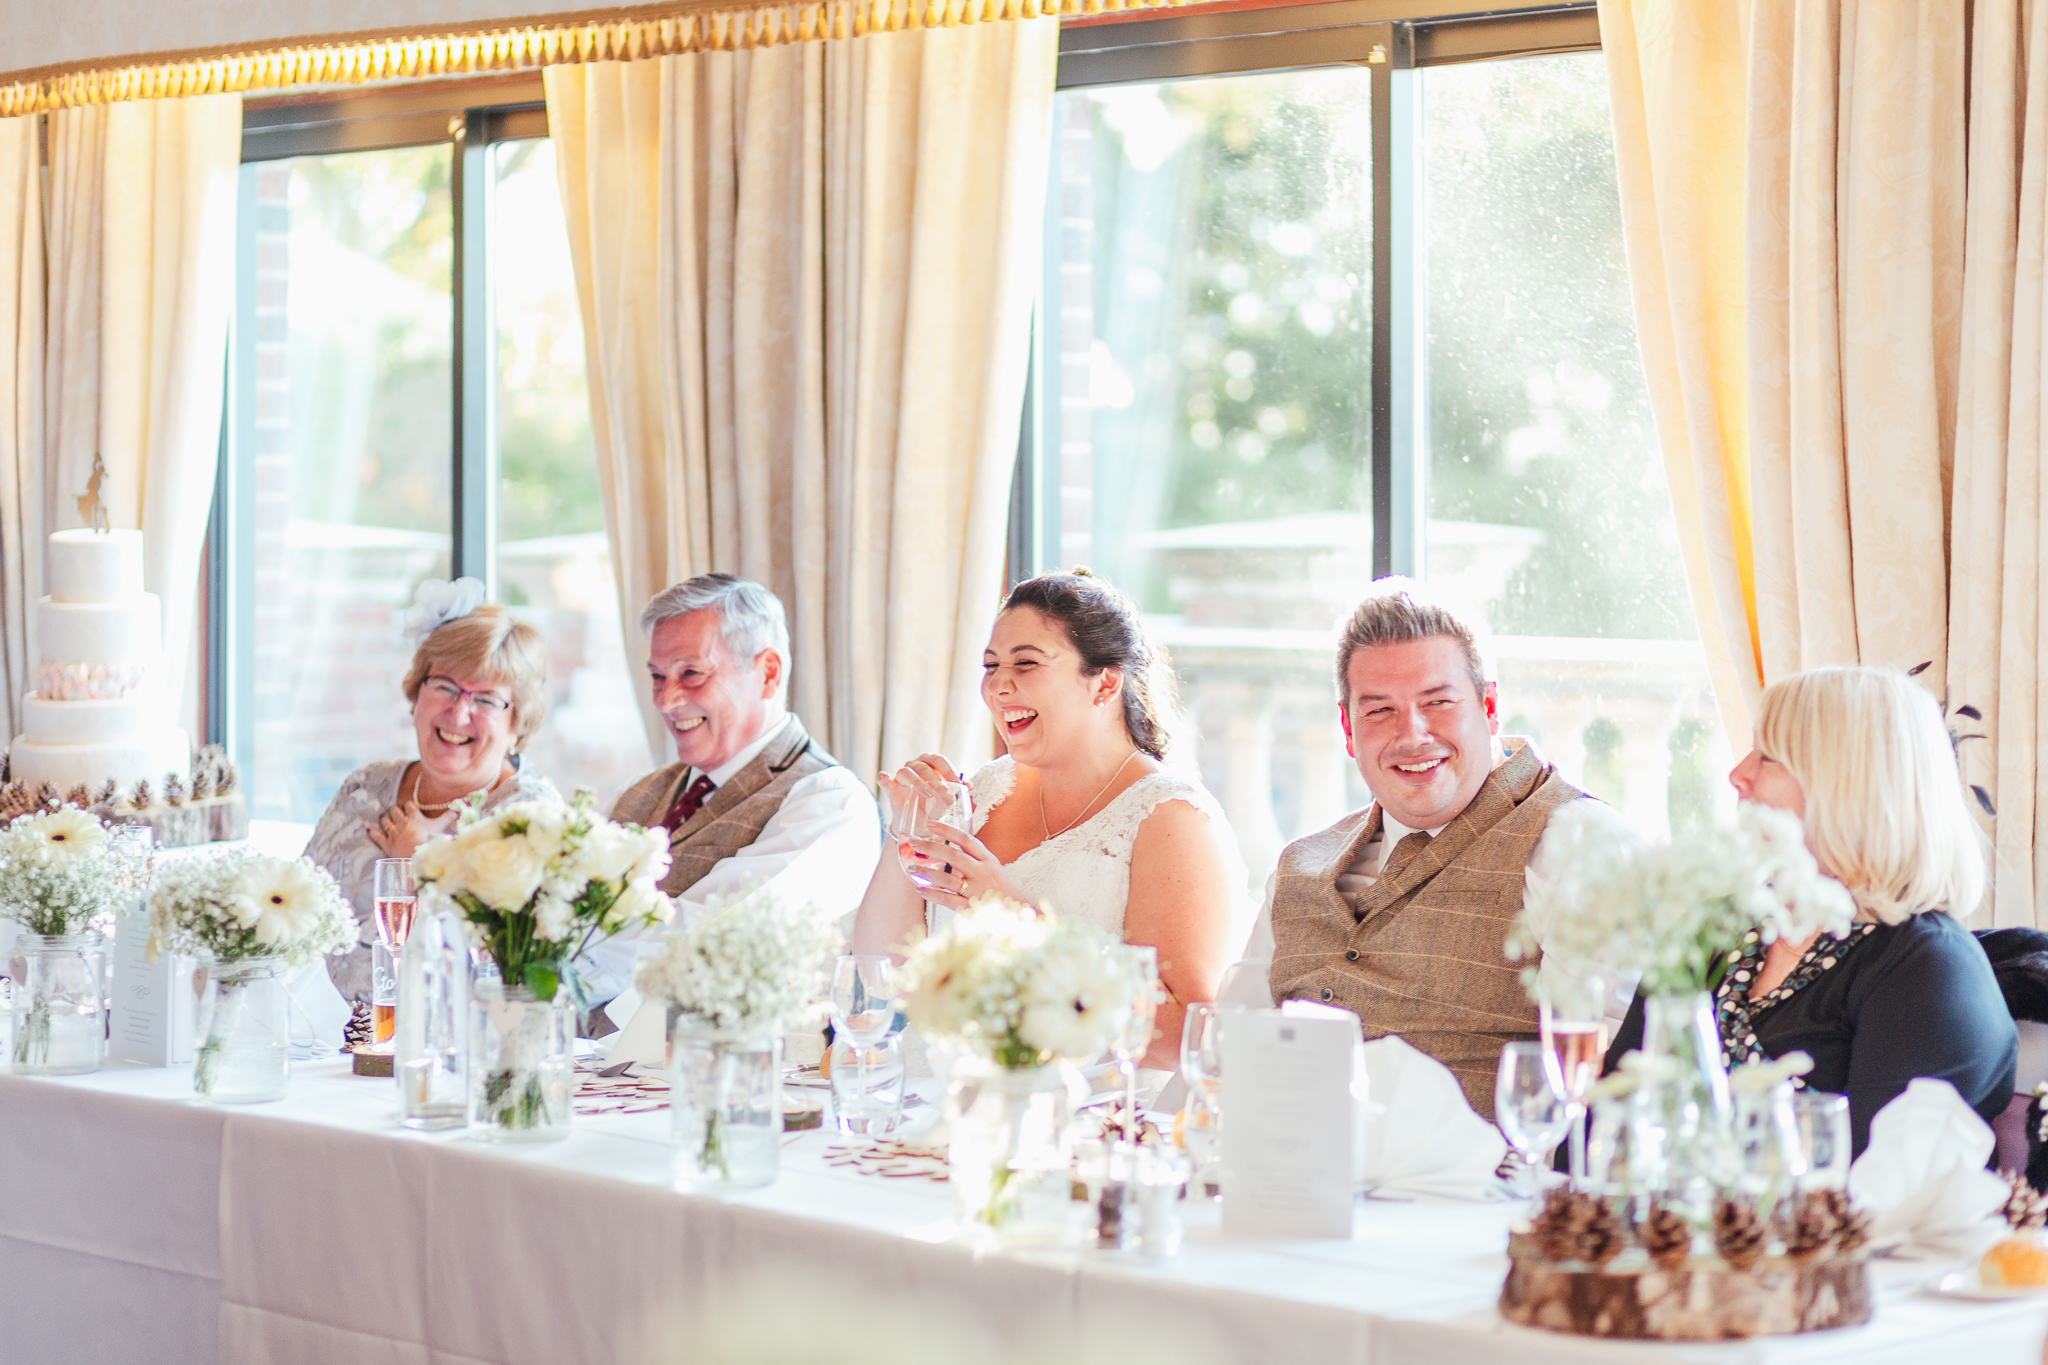 Willington-Hall-Cheshire-Wedding-40.jpg